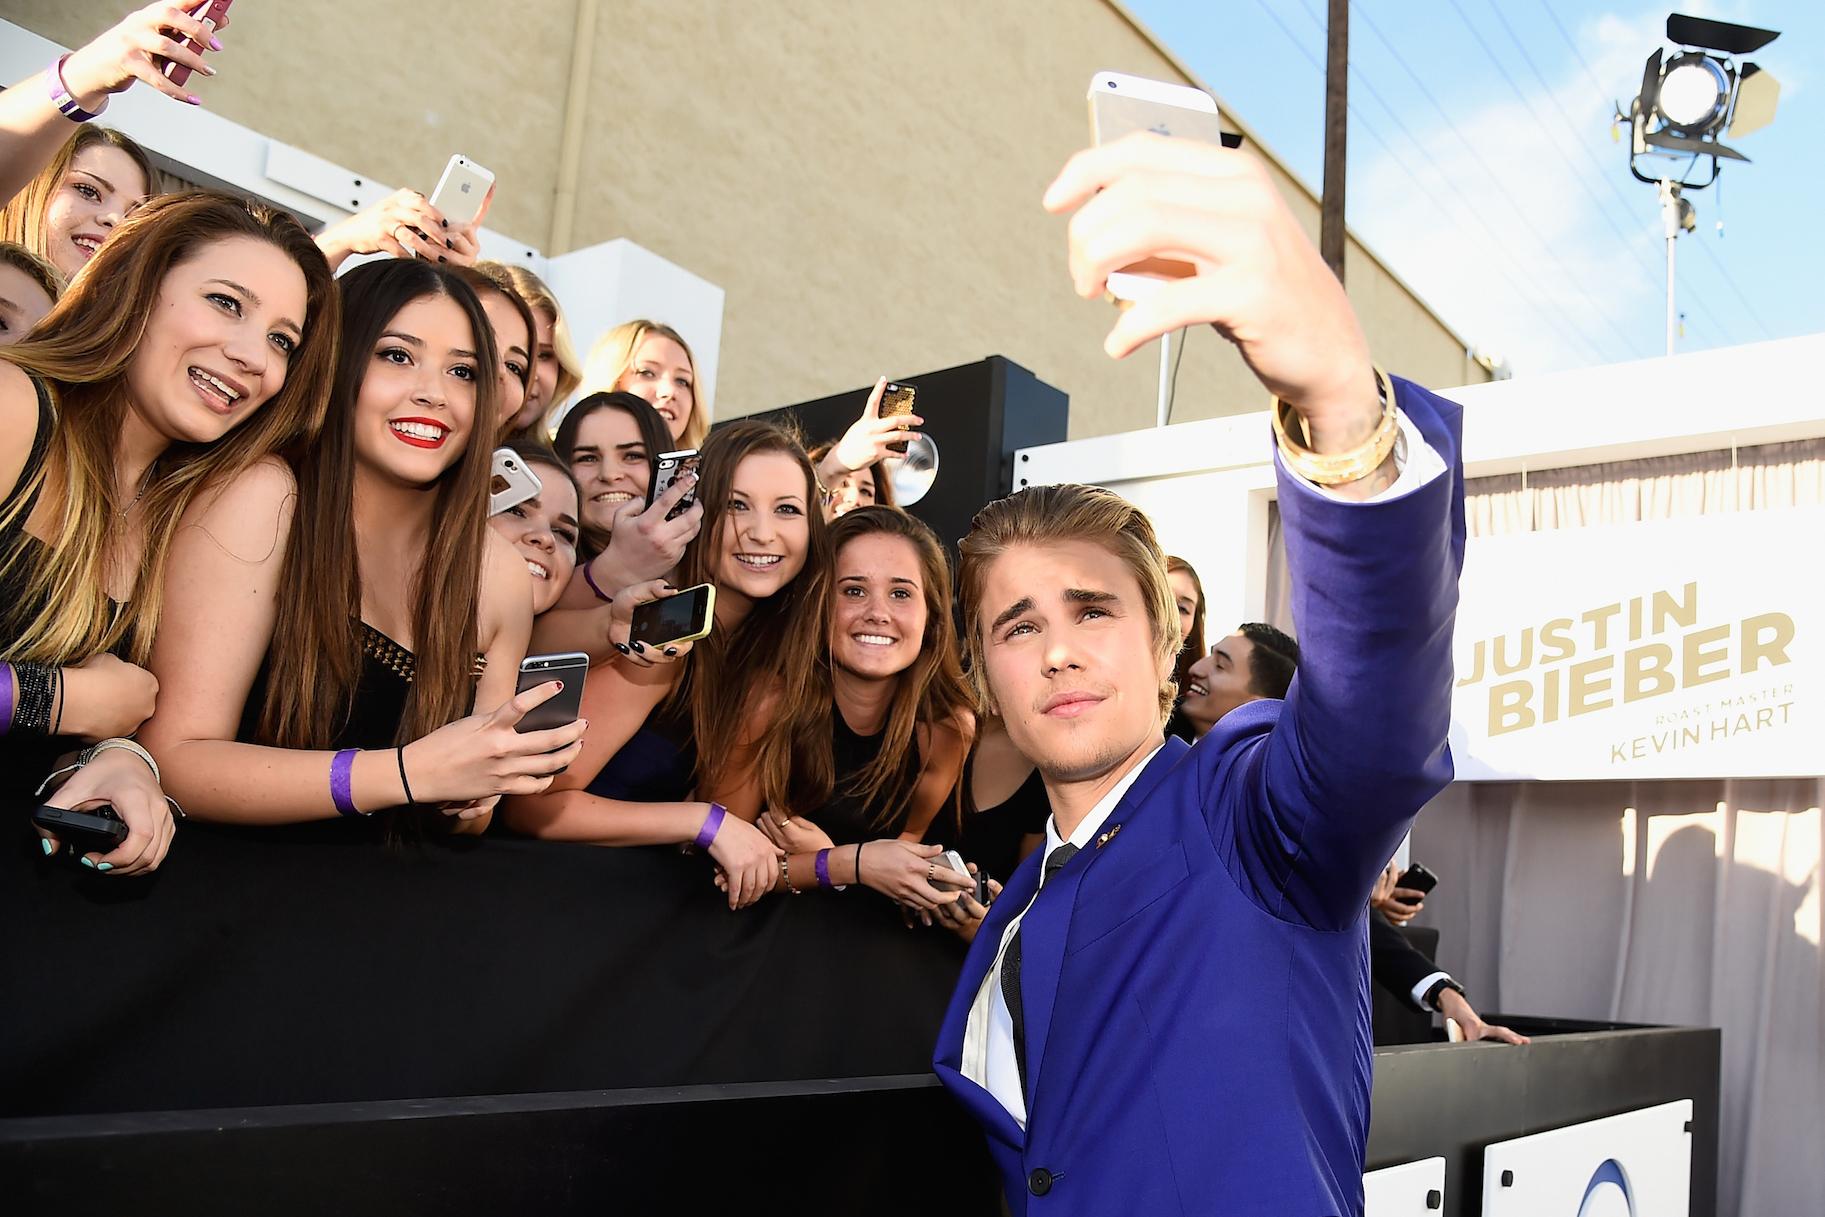 Justin biebers charging 2k per selfie and beliebers arent happy justin biebers charging 2k per selfie and beliebers arent happy very real kristyandbryce Choice Image